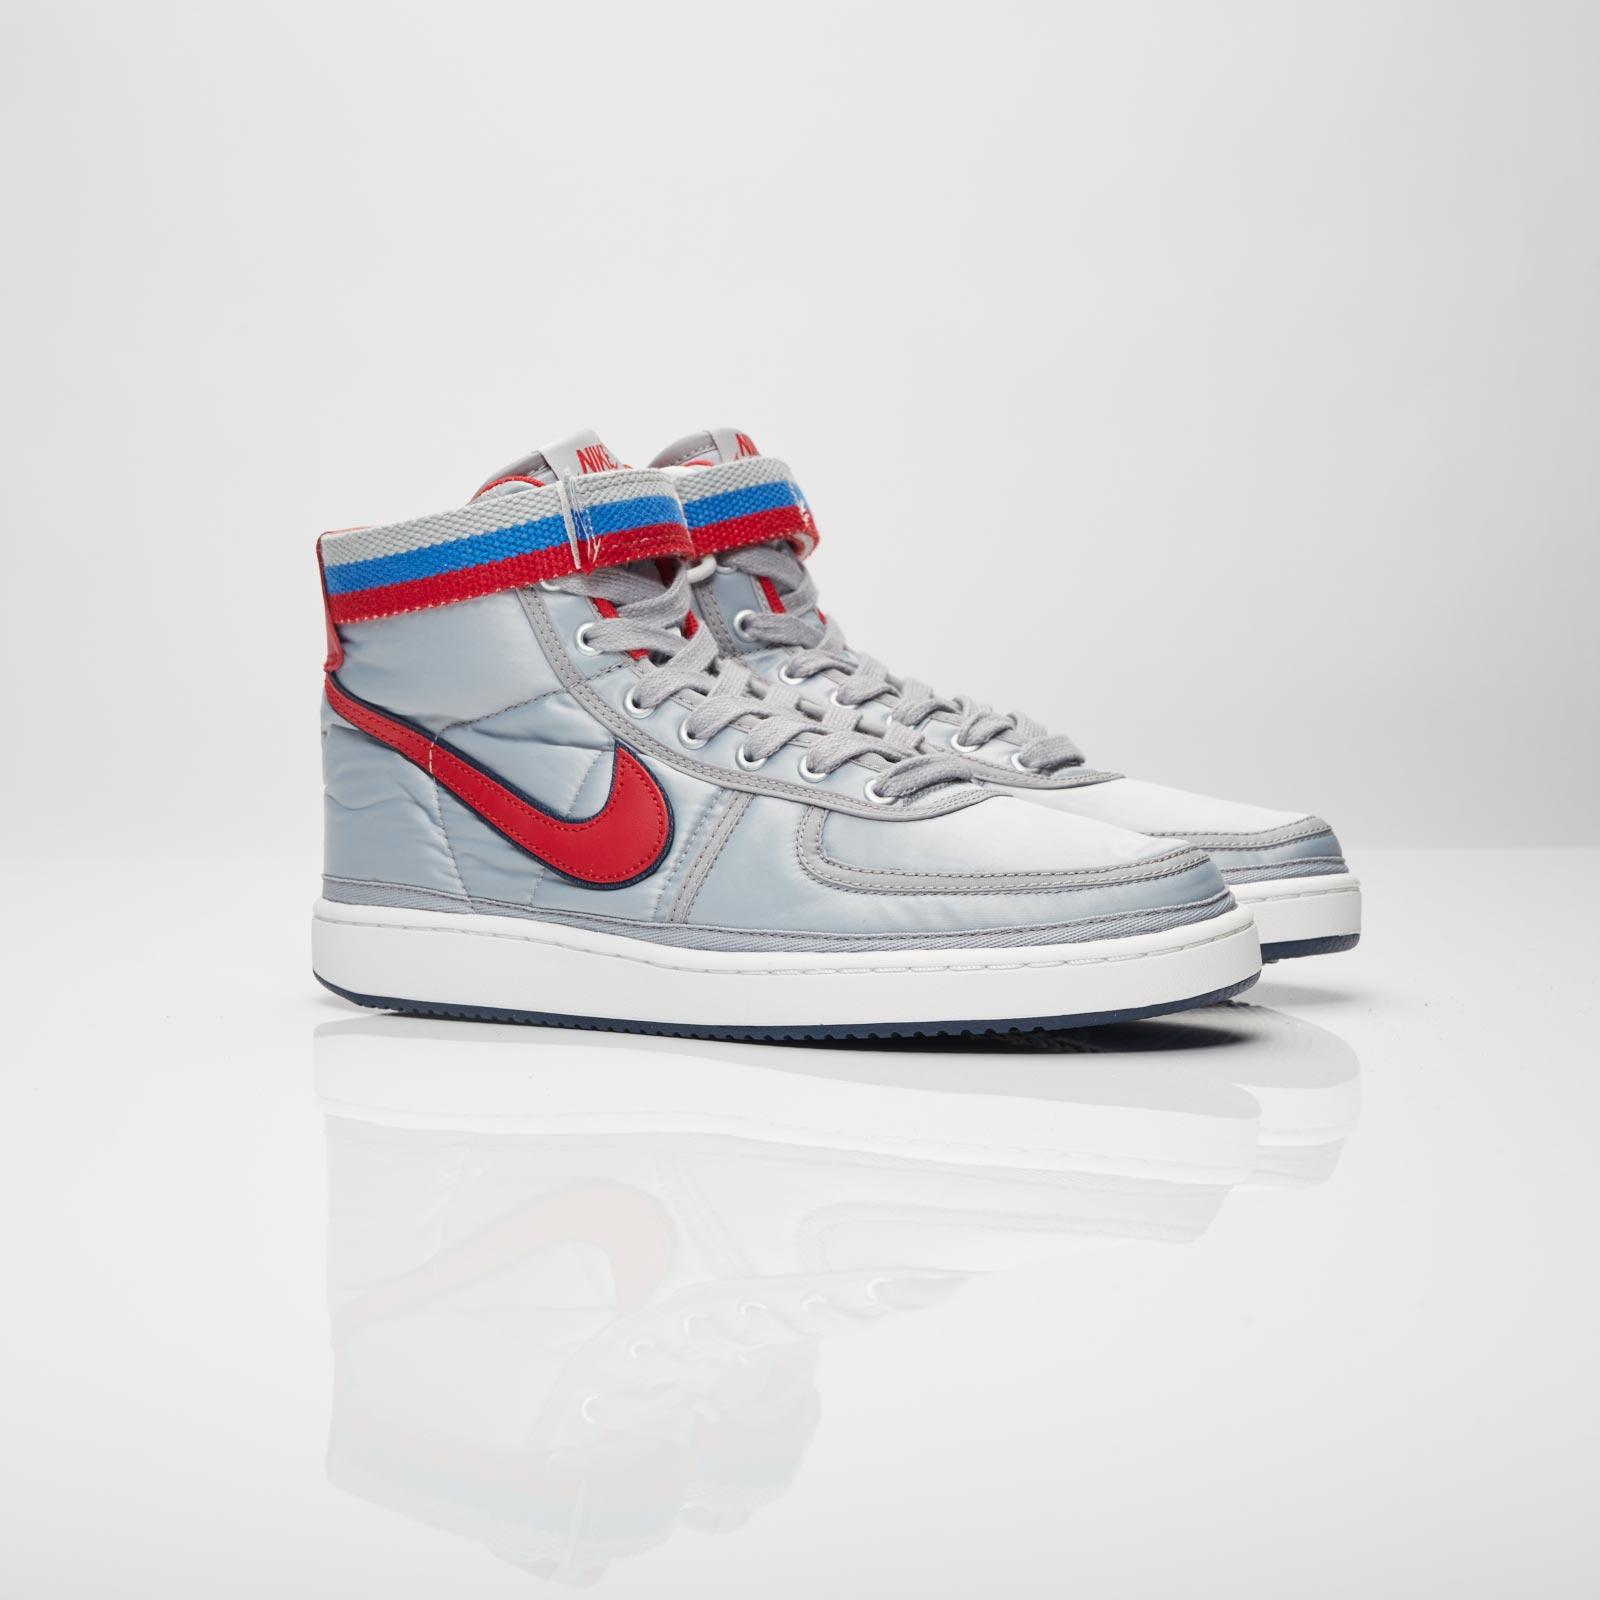 timeless design 561b3 b4a2a Nike Sportswear Vandal High Supreme QS